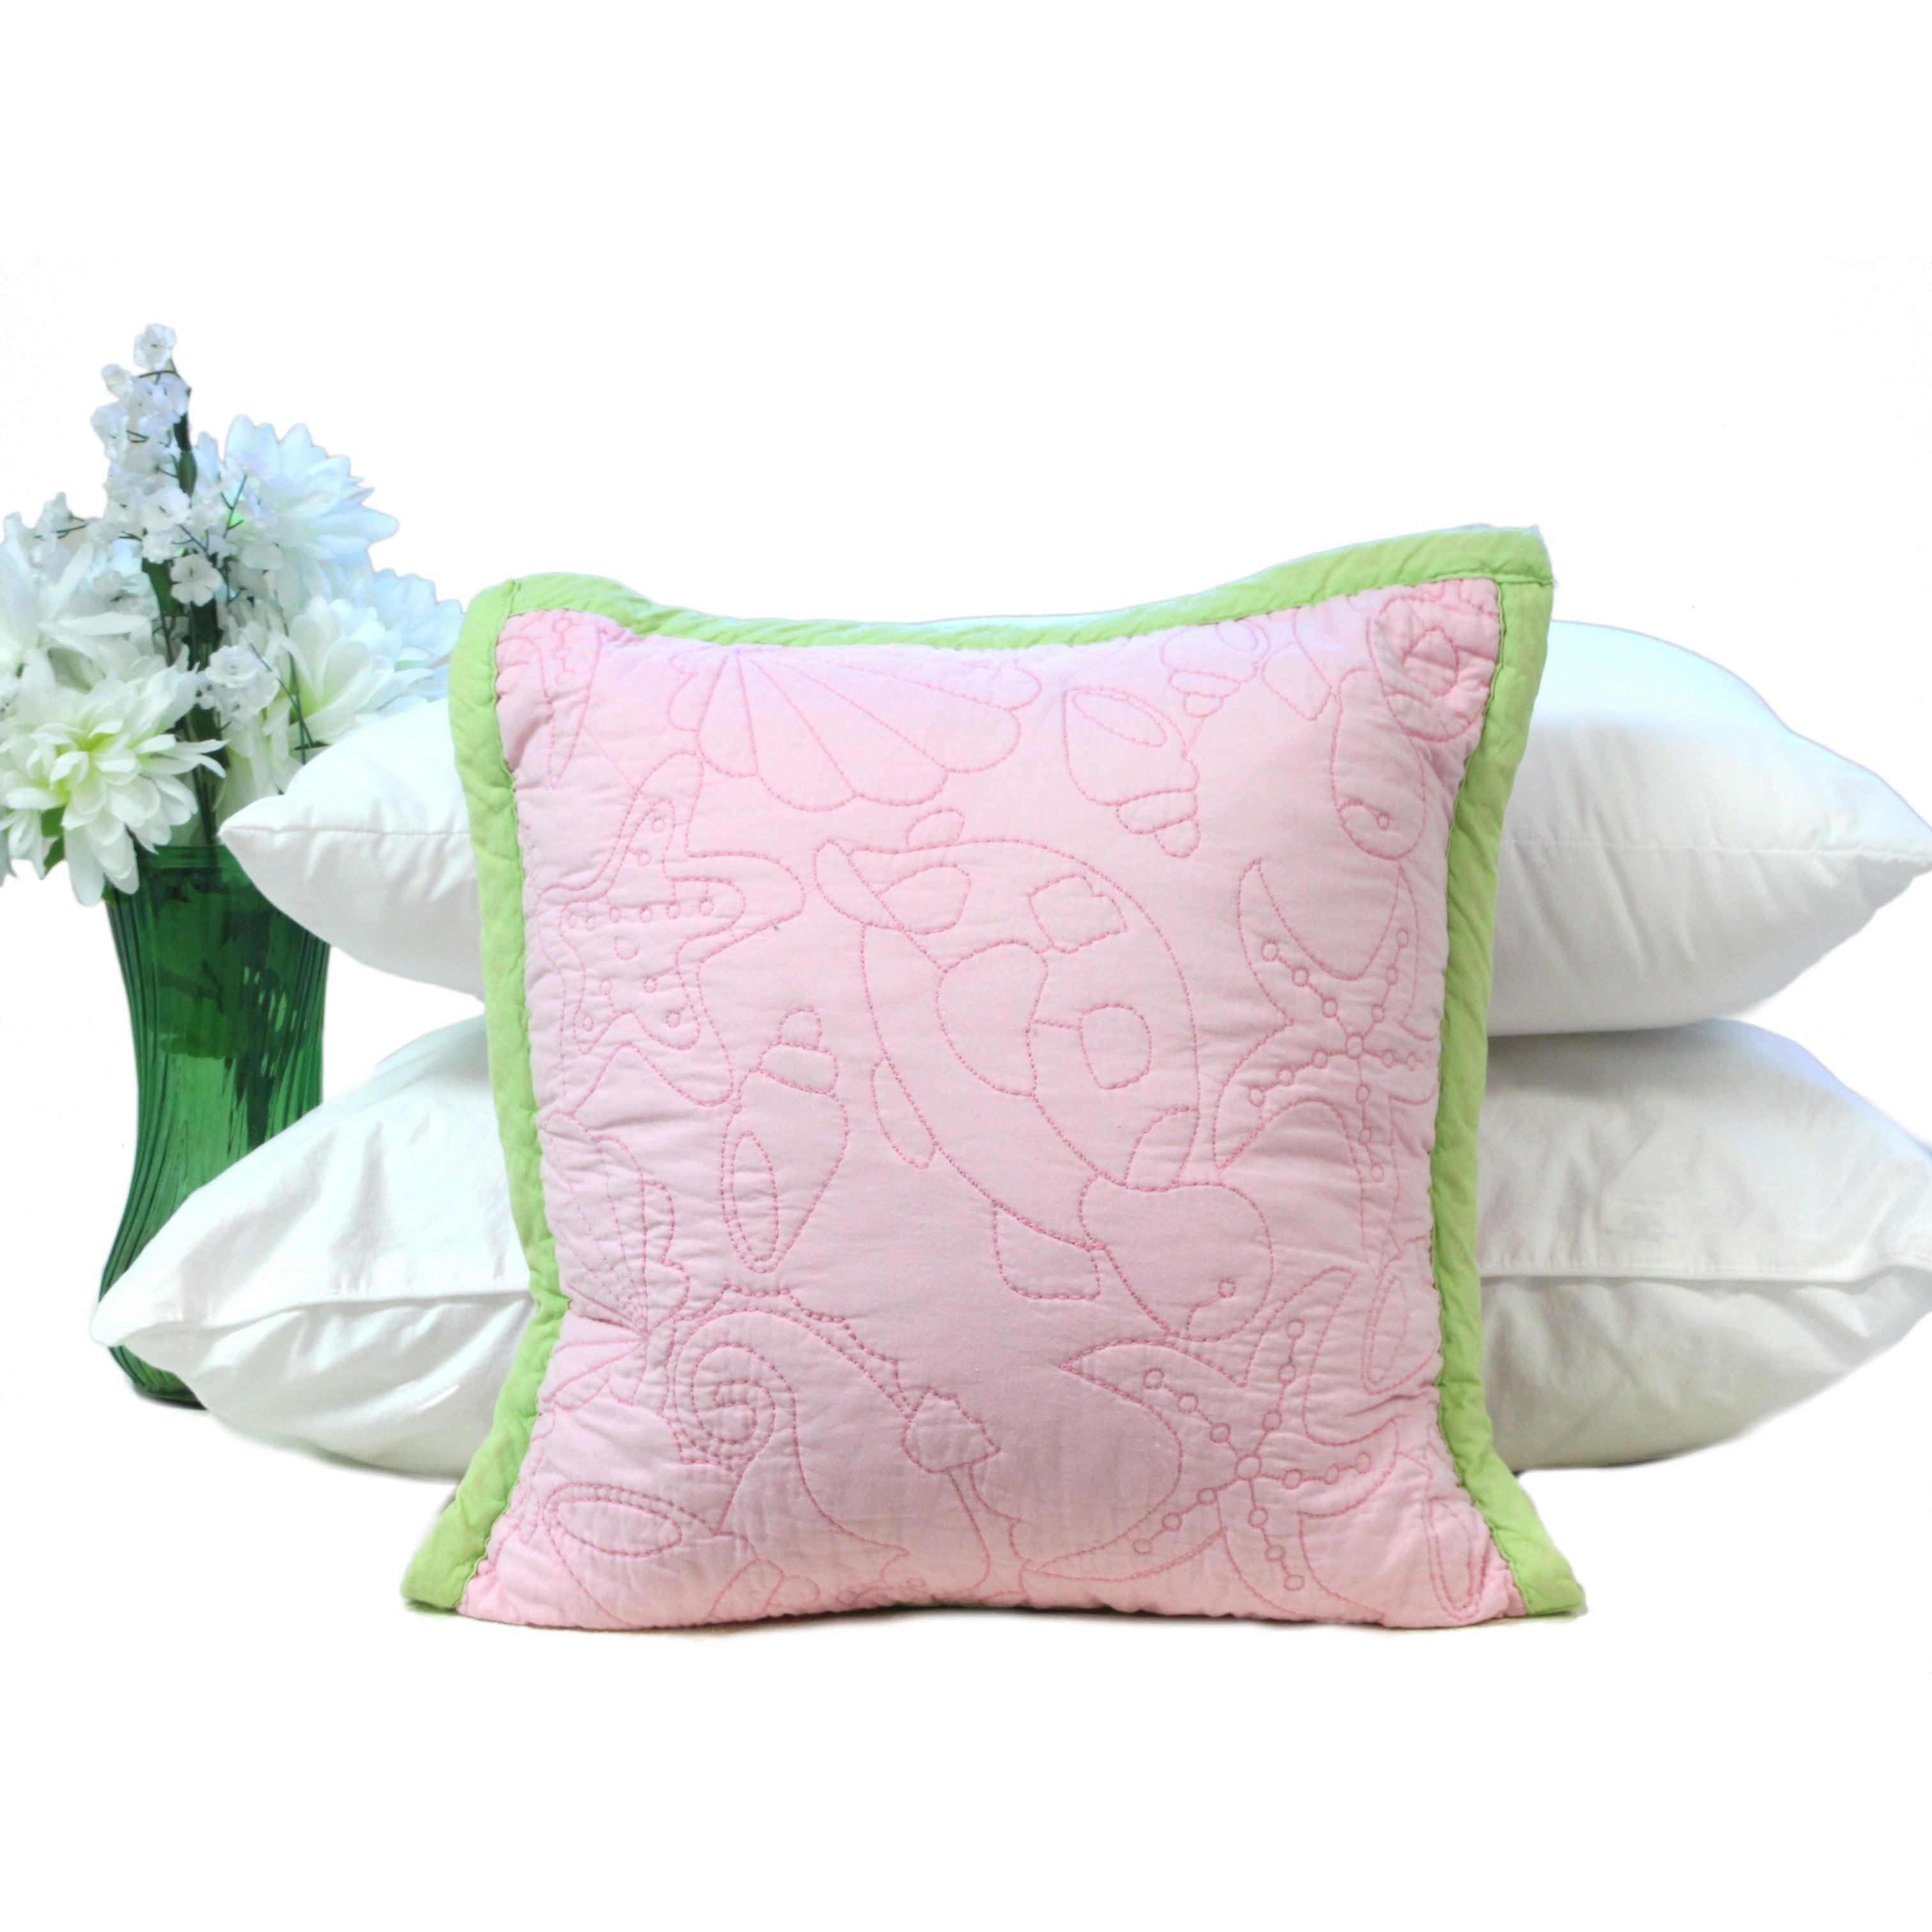 Pink Ocean Creatures Girl's 16-inch Decorative Pillow Sha...